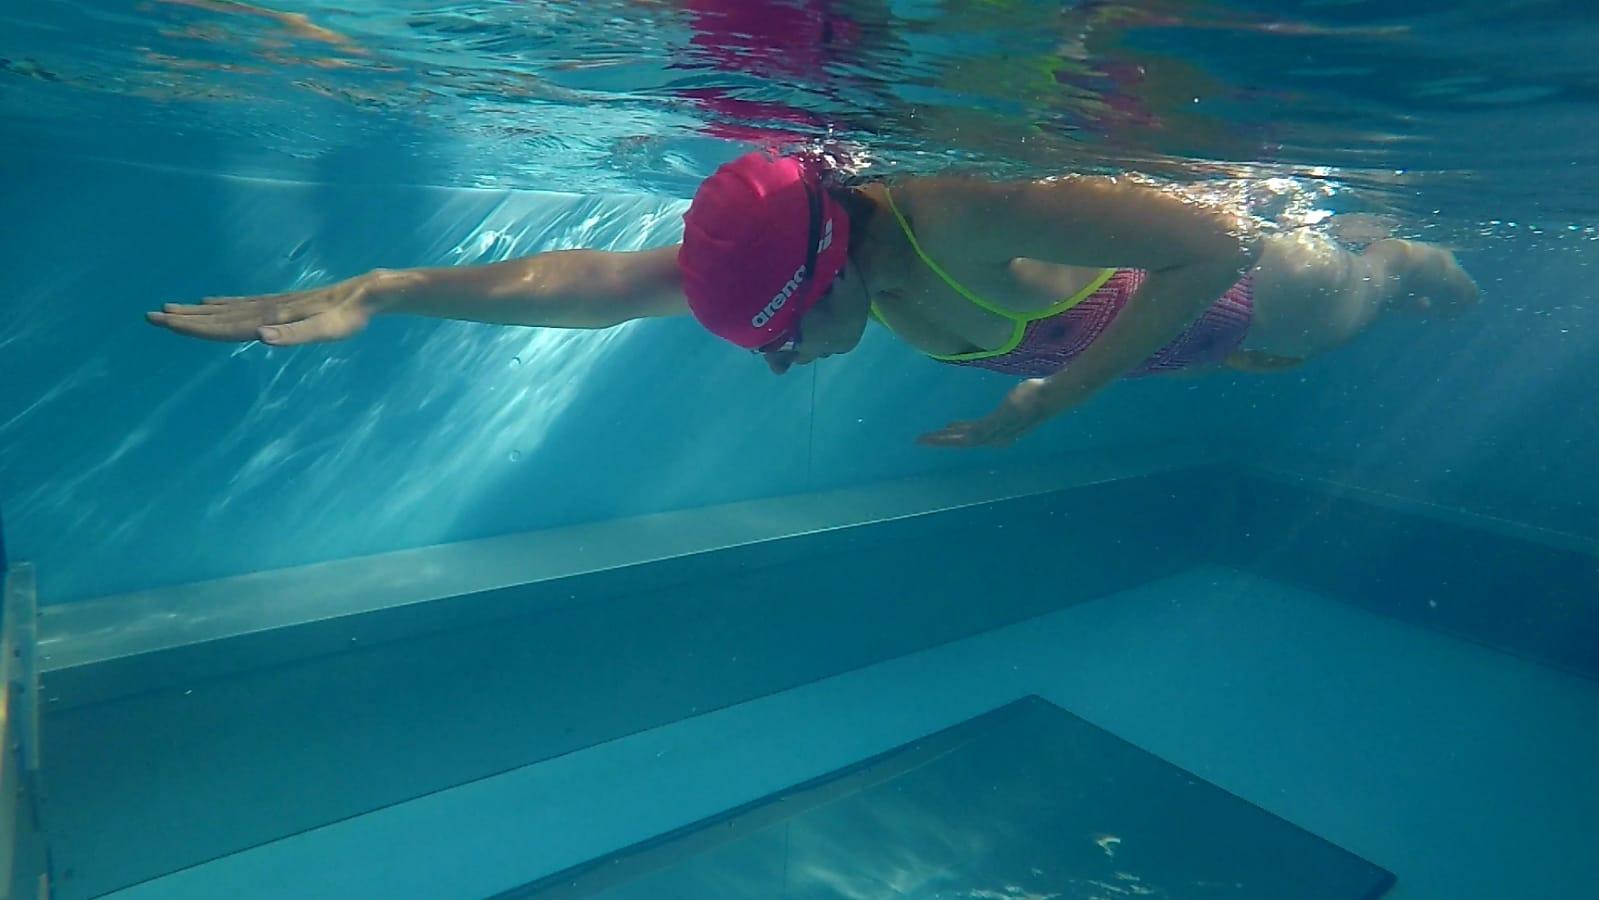 Hondjesslag zwemmen